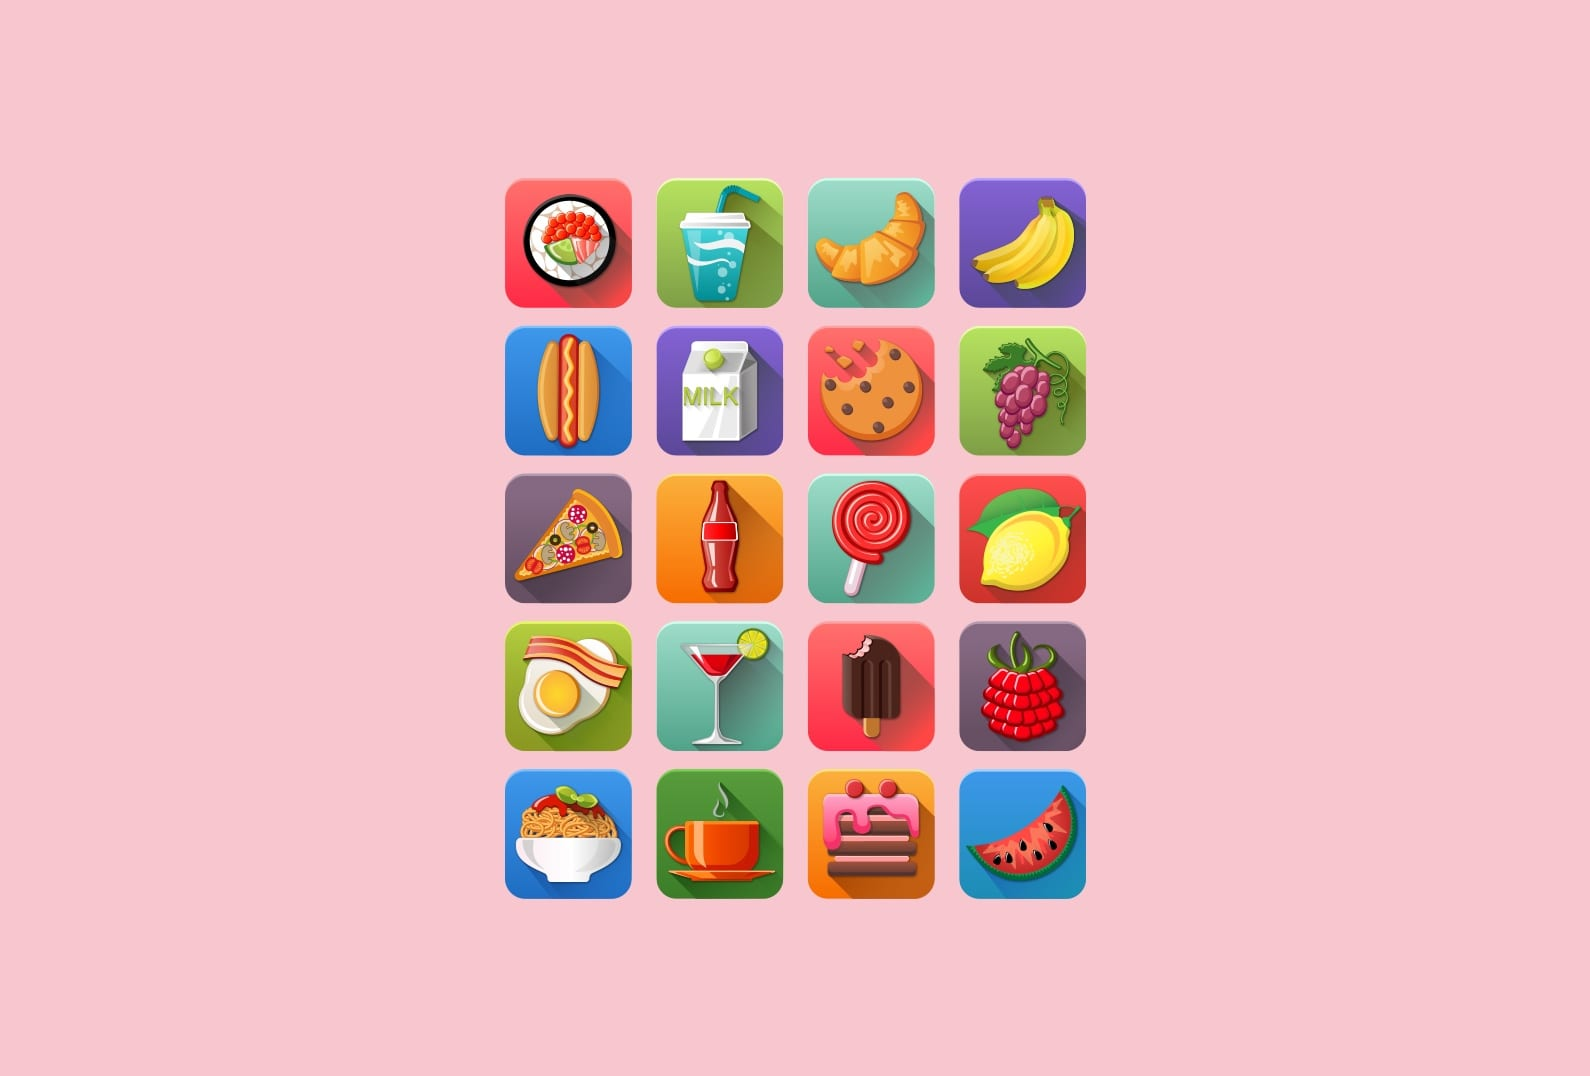 food-market/i/icns